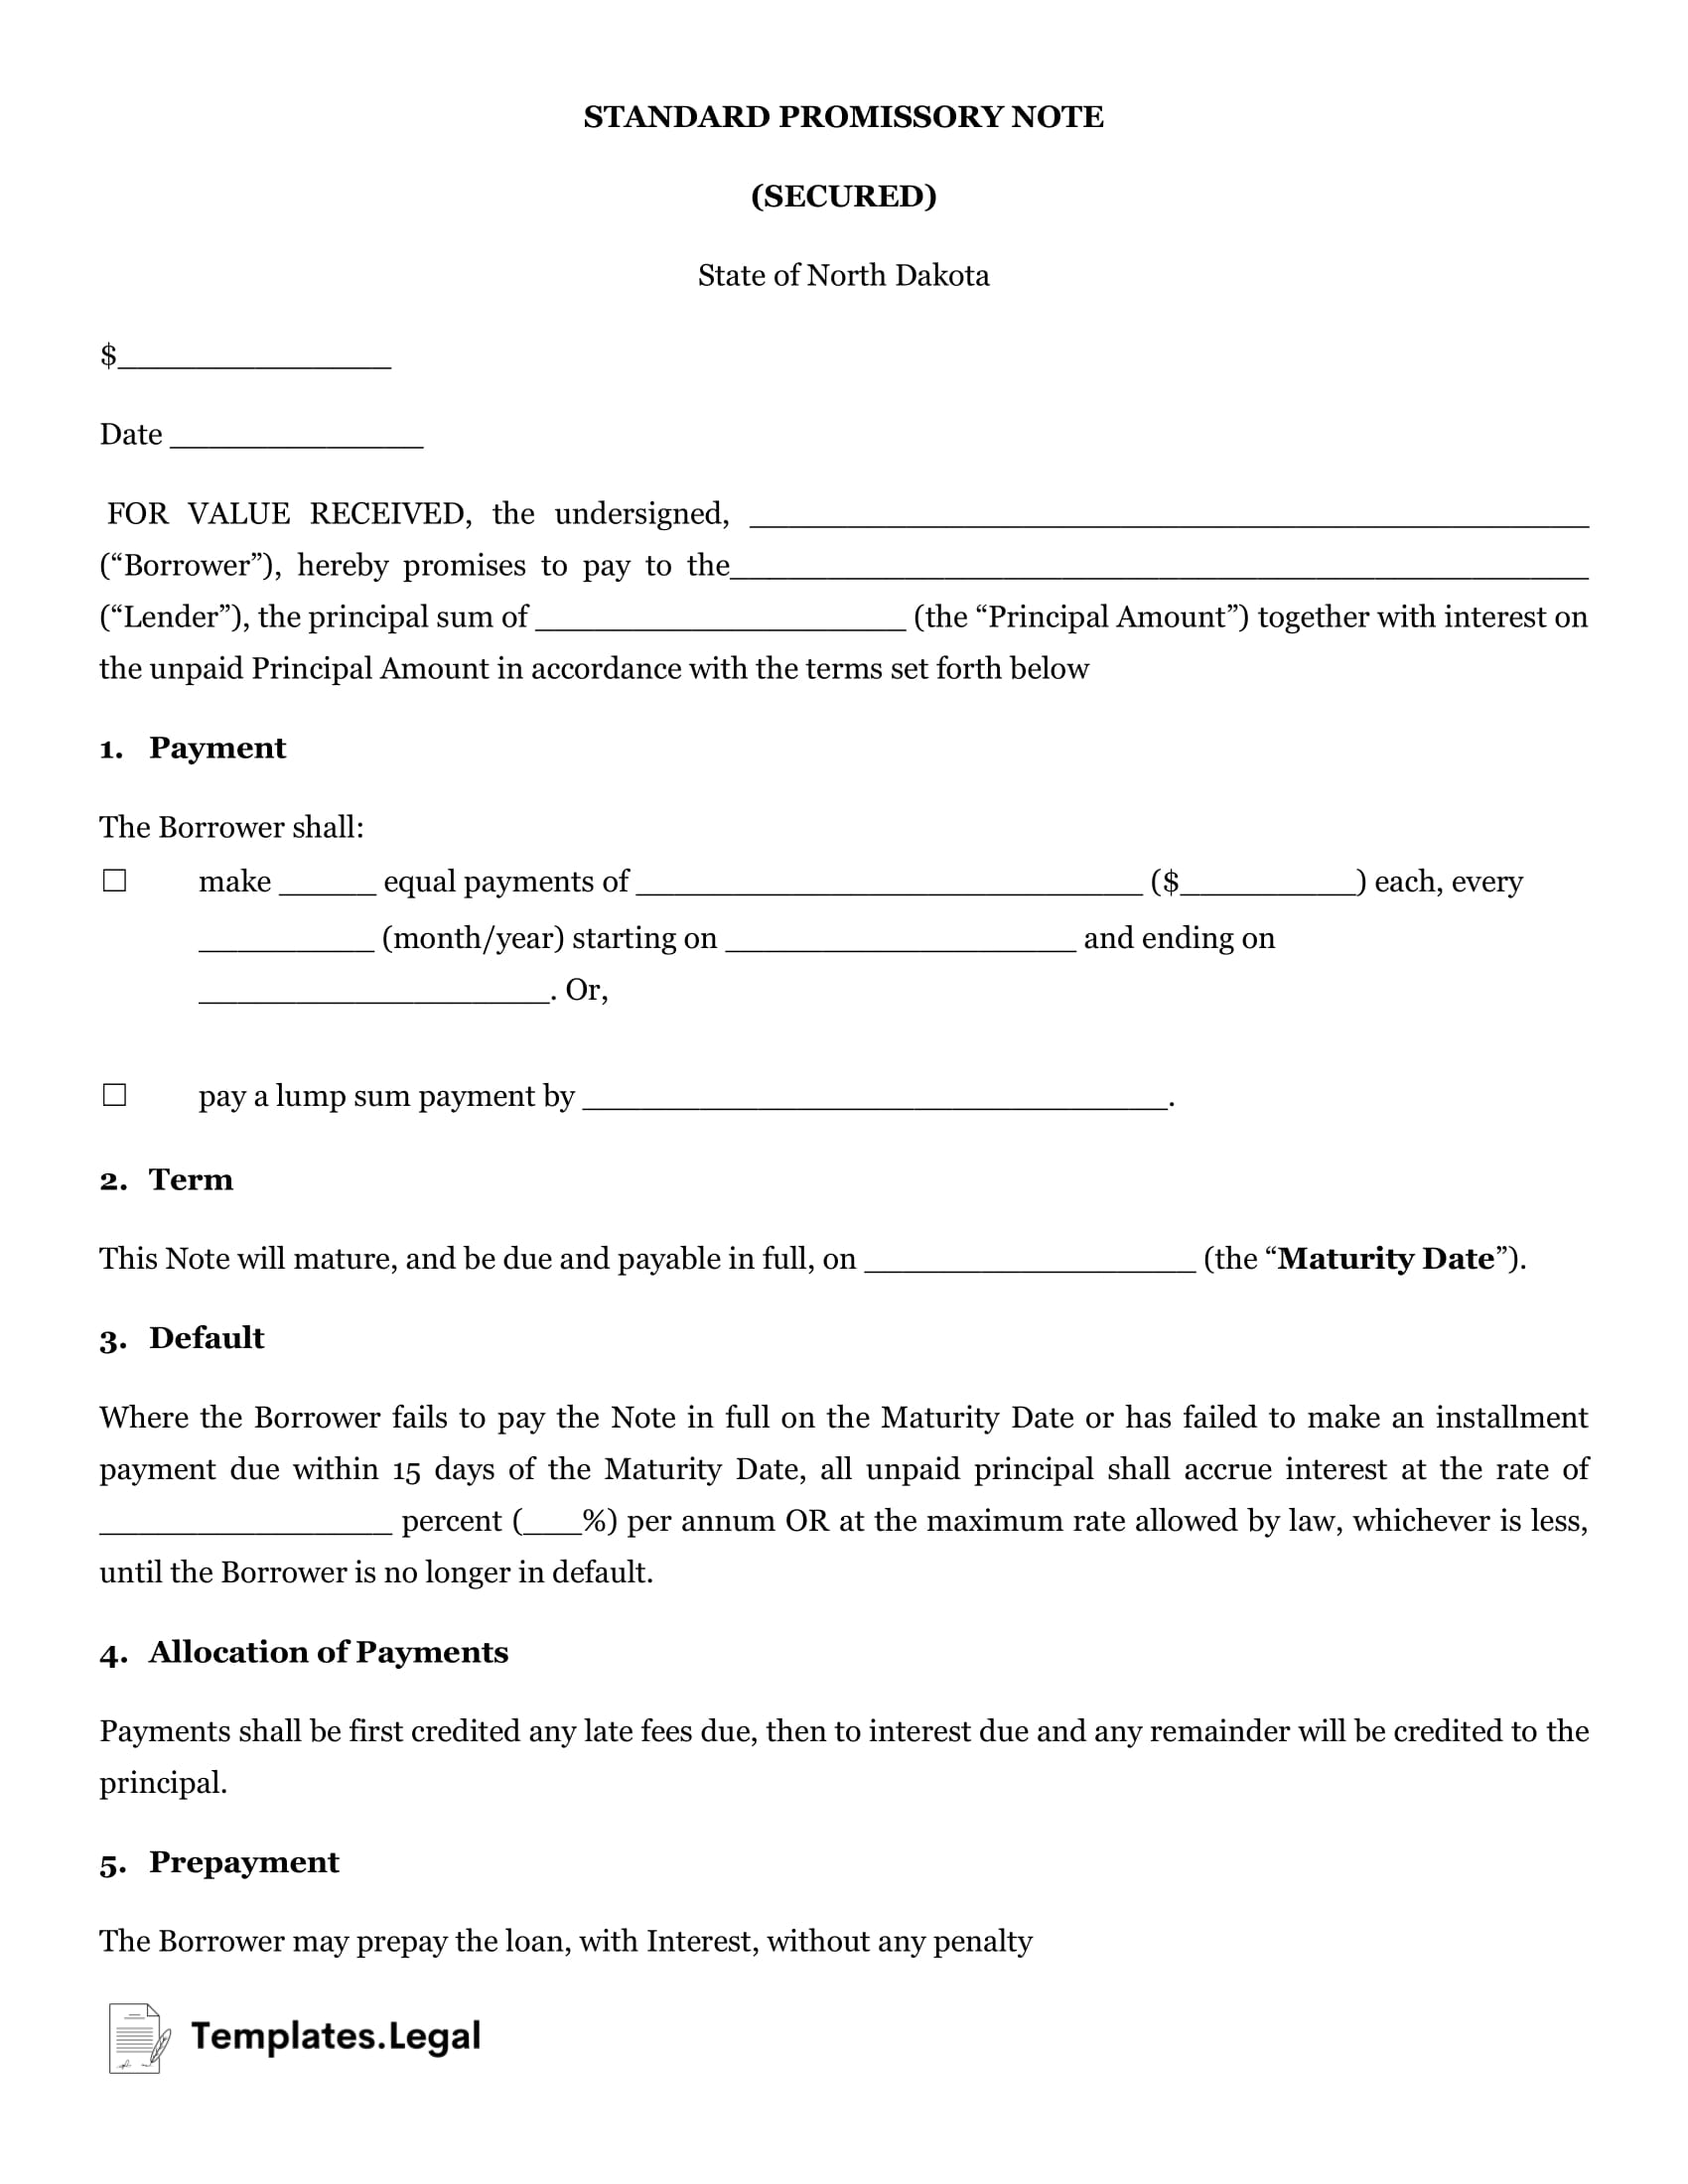 North Dakota Secured Promissory Note - Templates.Legal